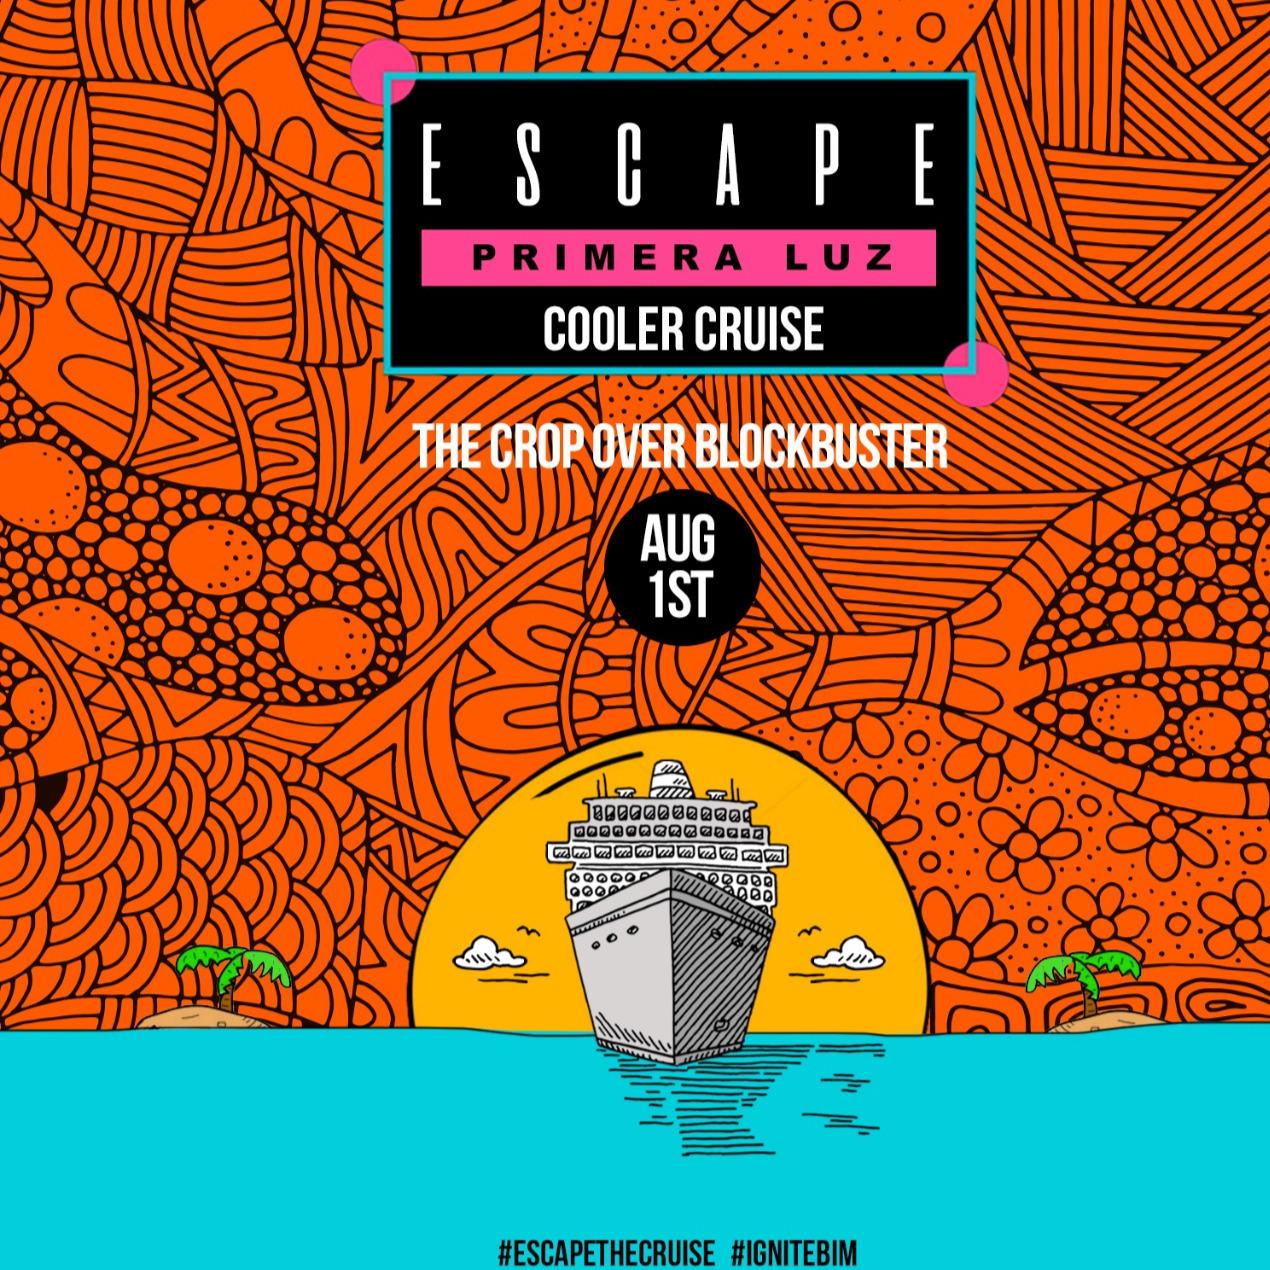 ESCAPE - PRIMERA LUZ COOLER CRUISE - THE CROP OVER BLOCKBUSTER